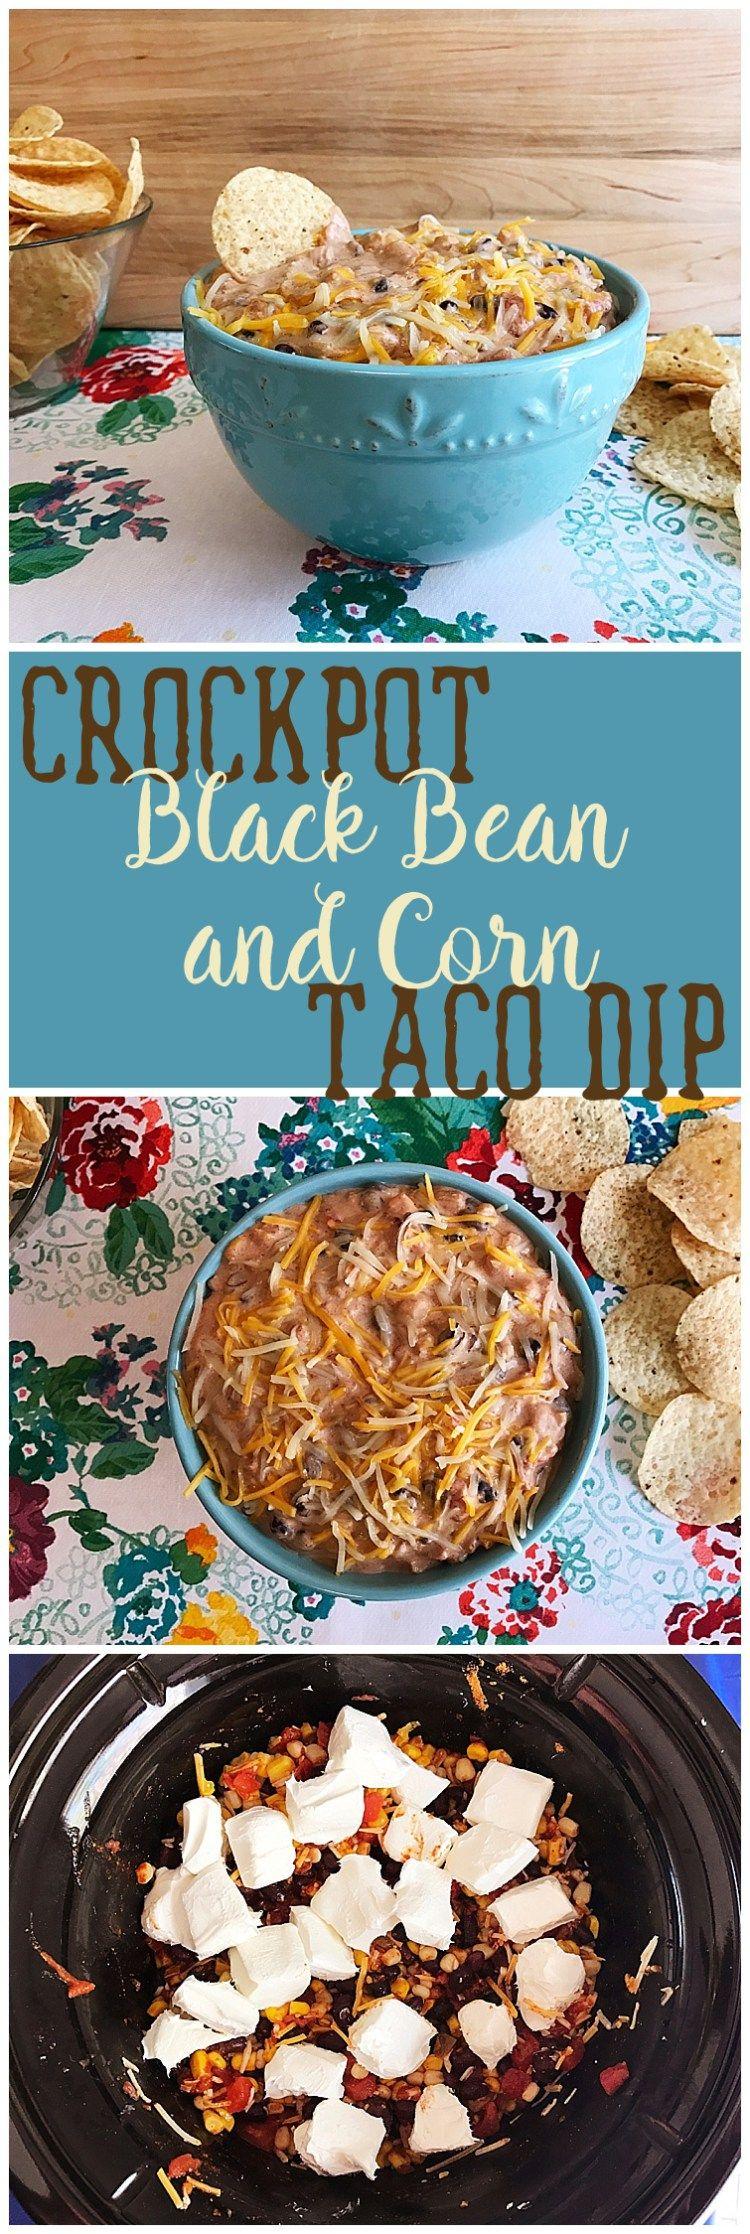 Crock Pot Black Bean and Corn Taco Dip - Six Clever Sisters